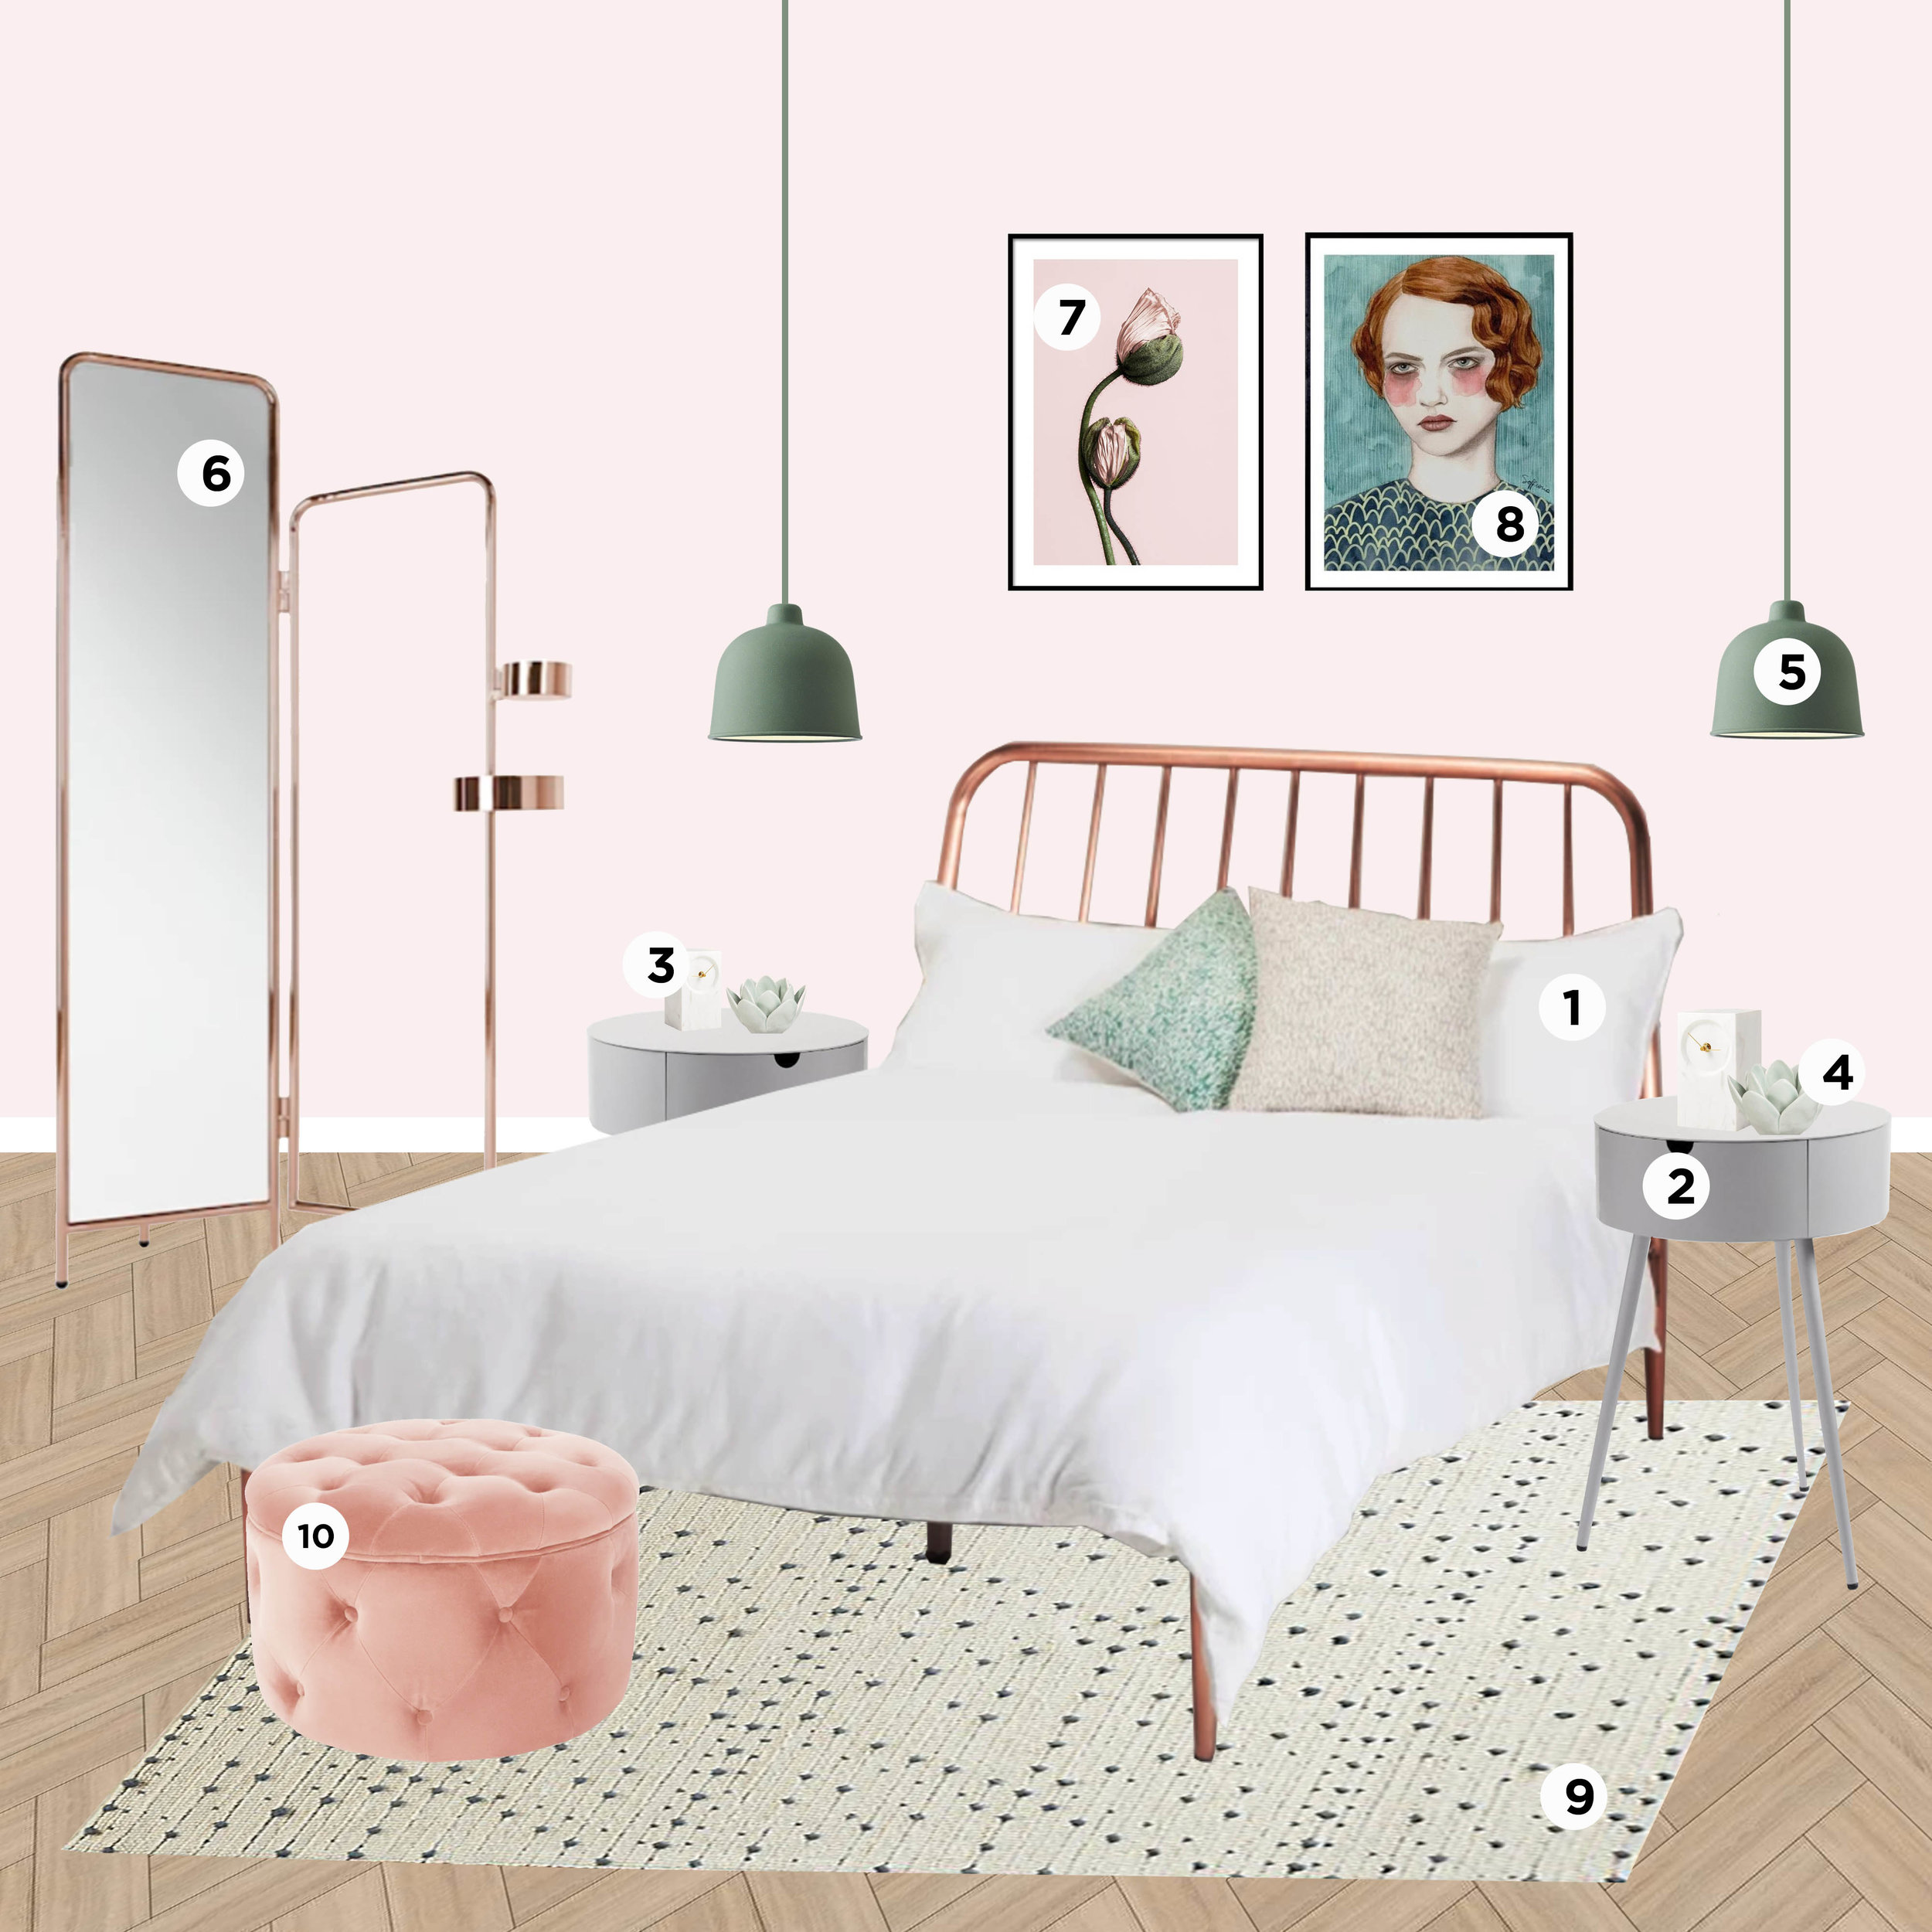 pokestudio_moodofthemonth_rosequartz_styling_interiordesign_bedroom